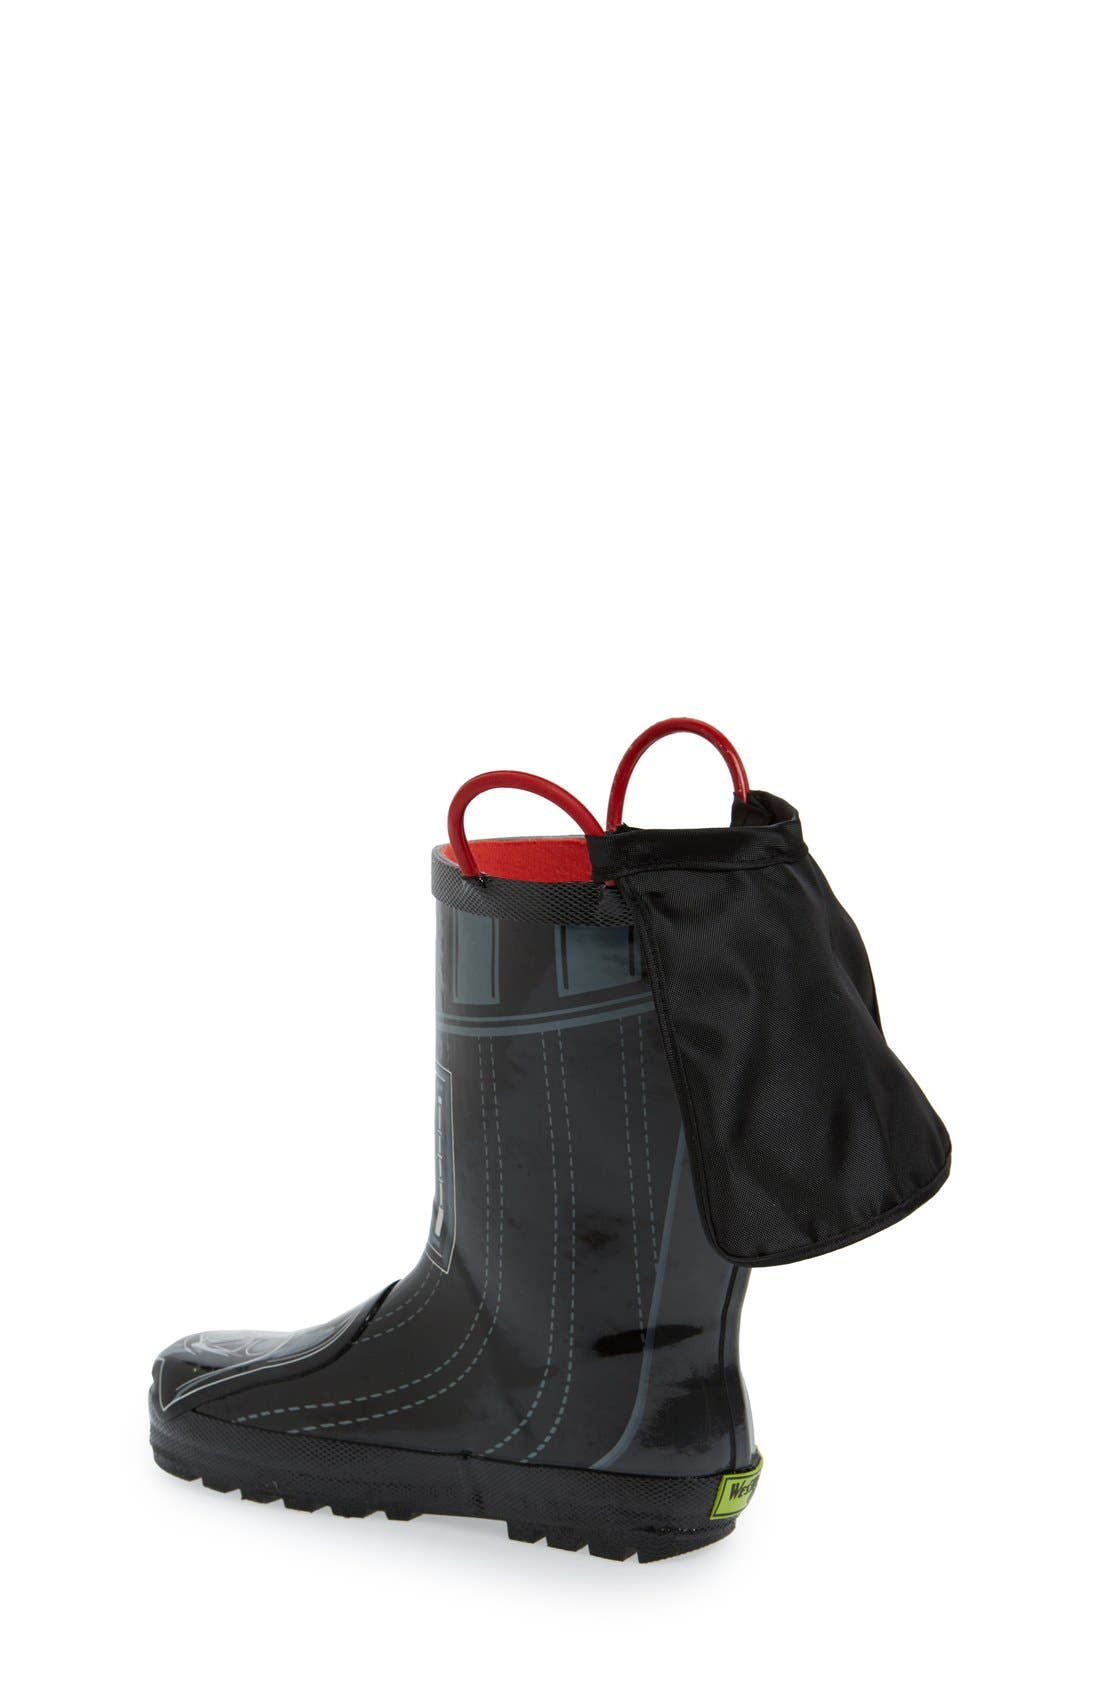 Star Wars<sup>™</sup> - Darth Vader Waterproof Rain Boot,                             Alternate thumbnail 3, color,                             001